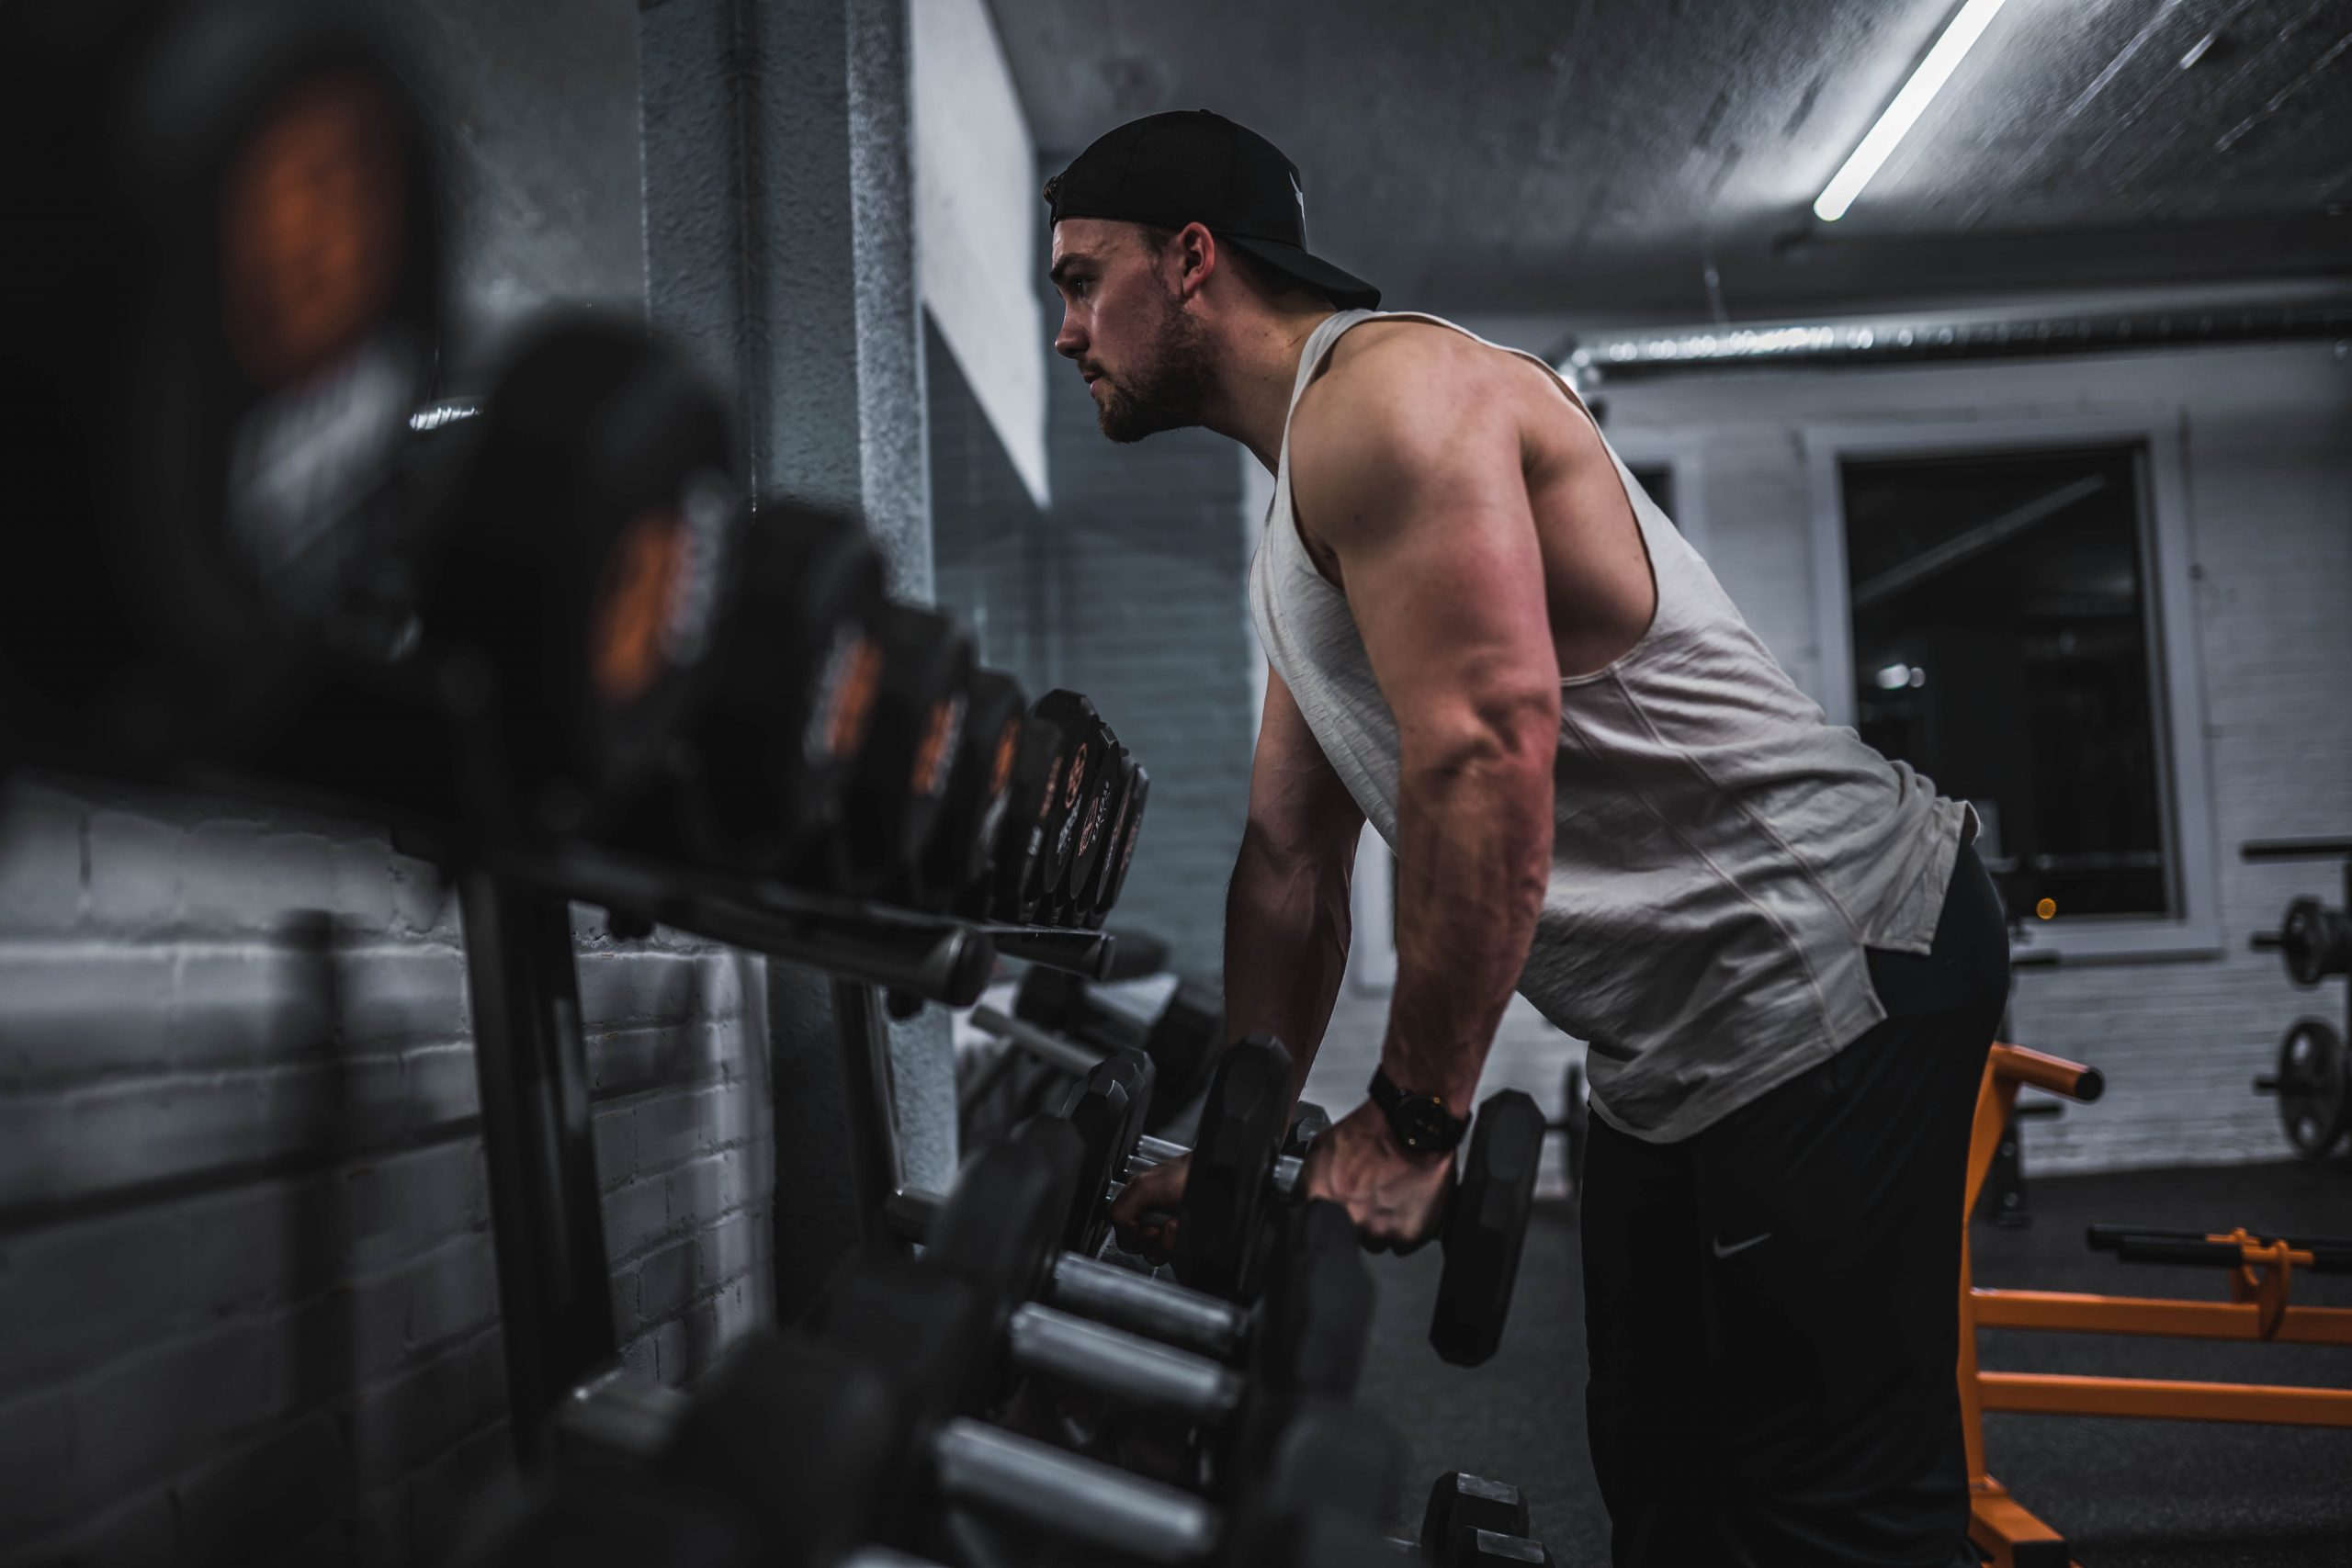 Muscle Building Goals